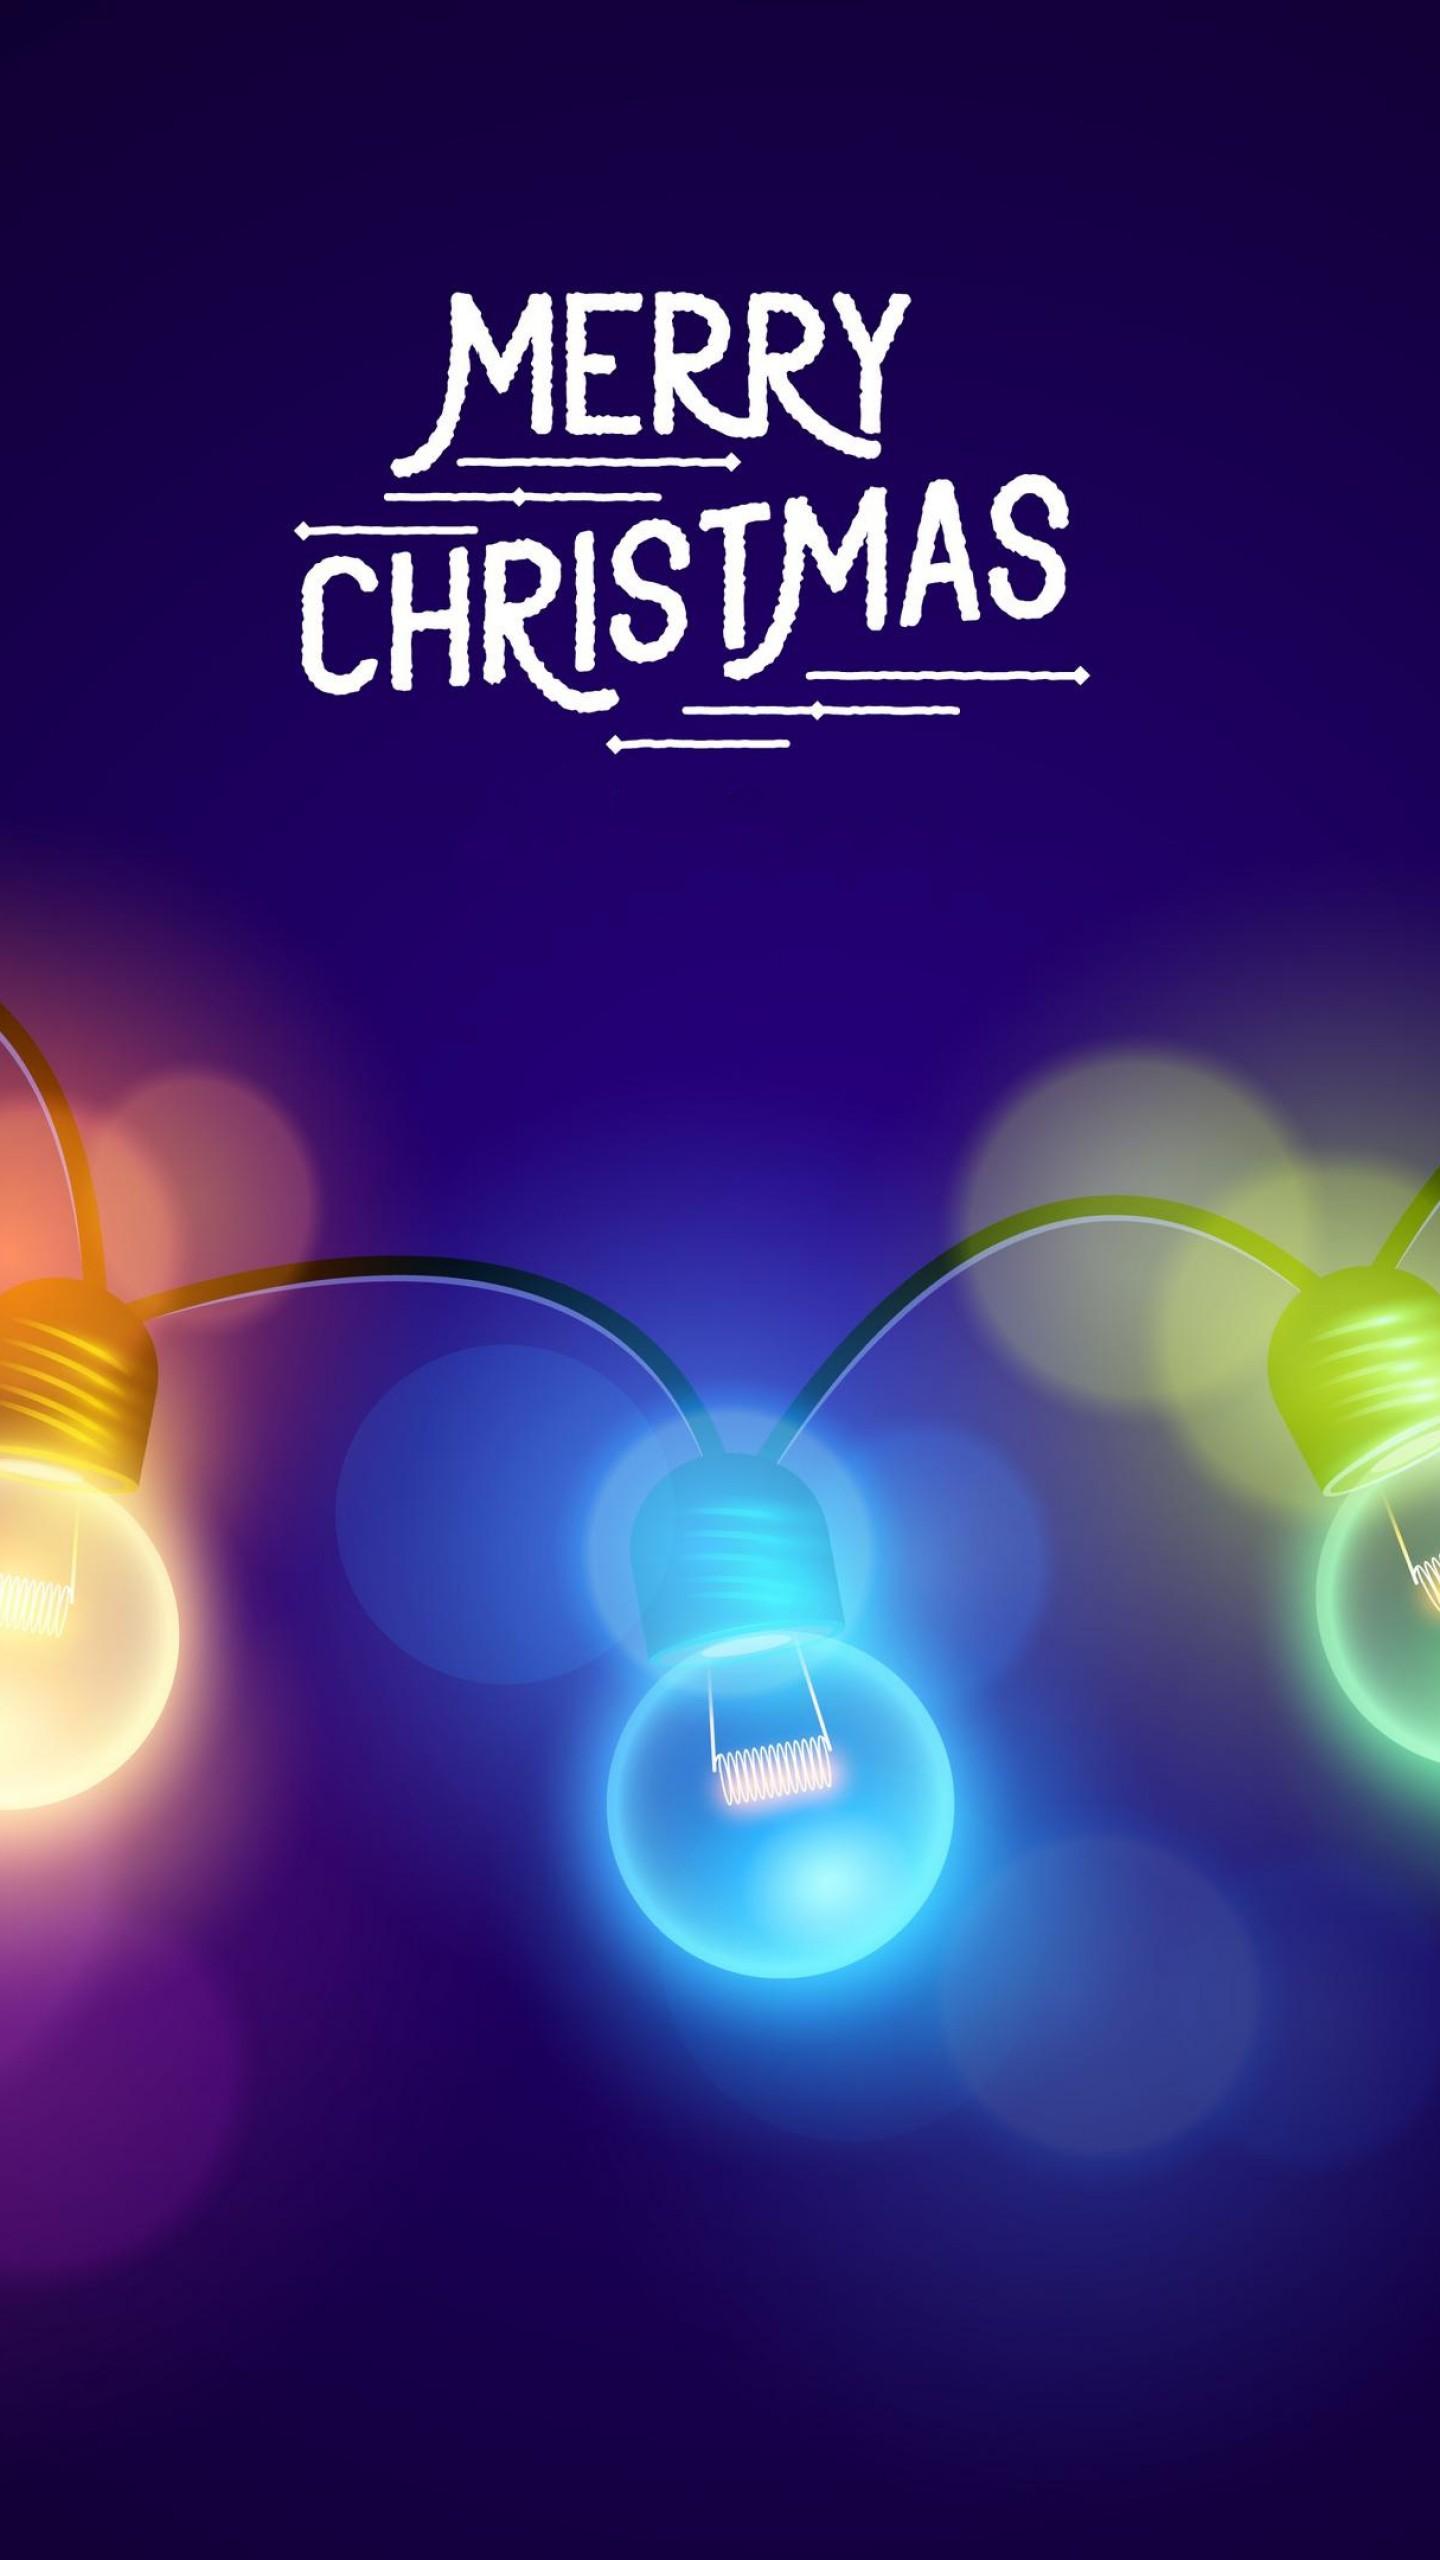 Merry Christmas Lights Iphone Wallpaper - Merry Christmas 1080 X 1920 , HD Wallpaper & Backgrounds